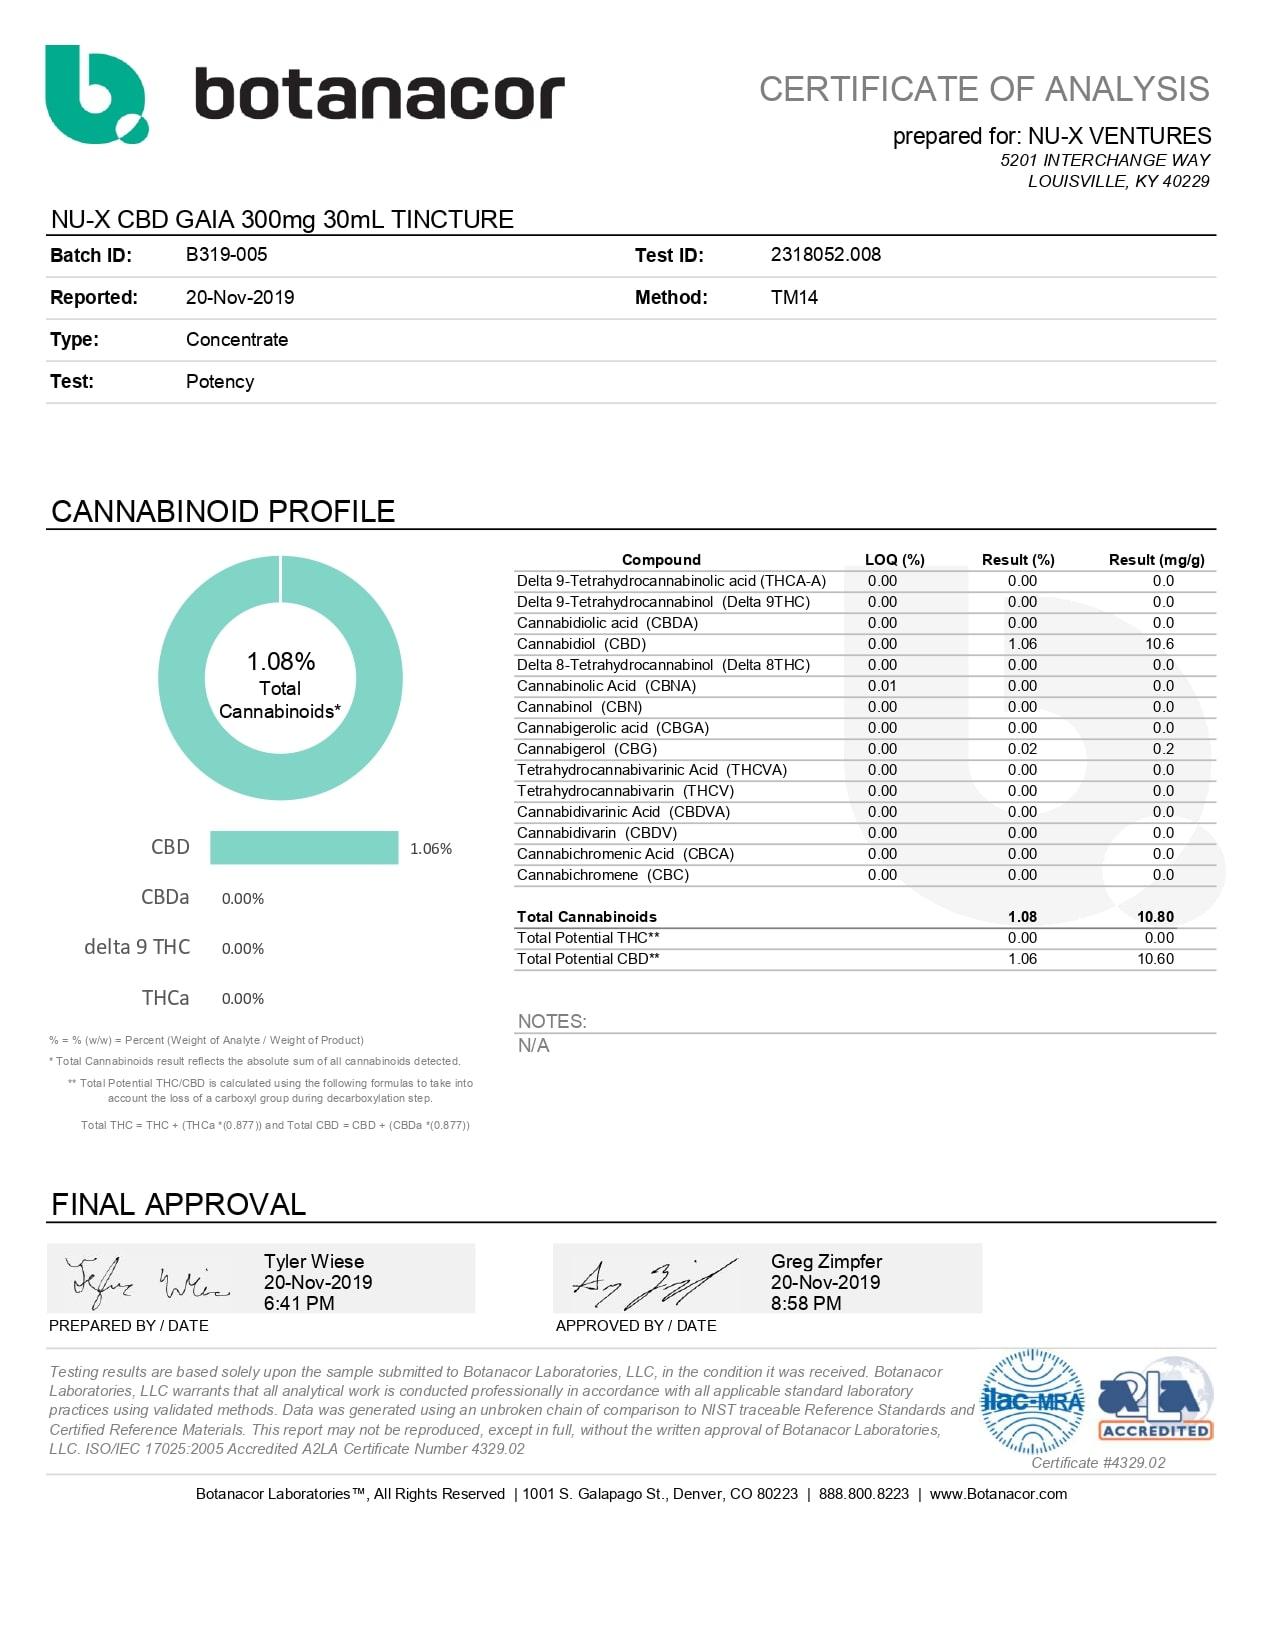 NU-X CBD Tincture Lab Report Gaia Pina Colada Coconut 300mg